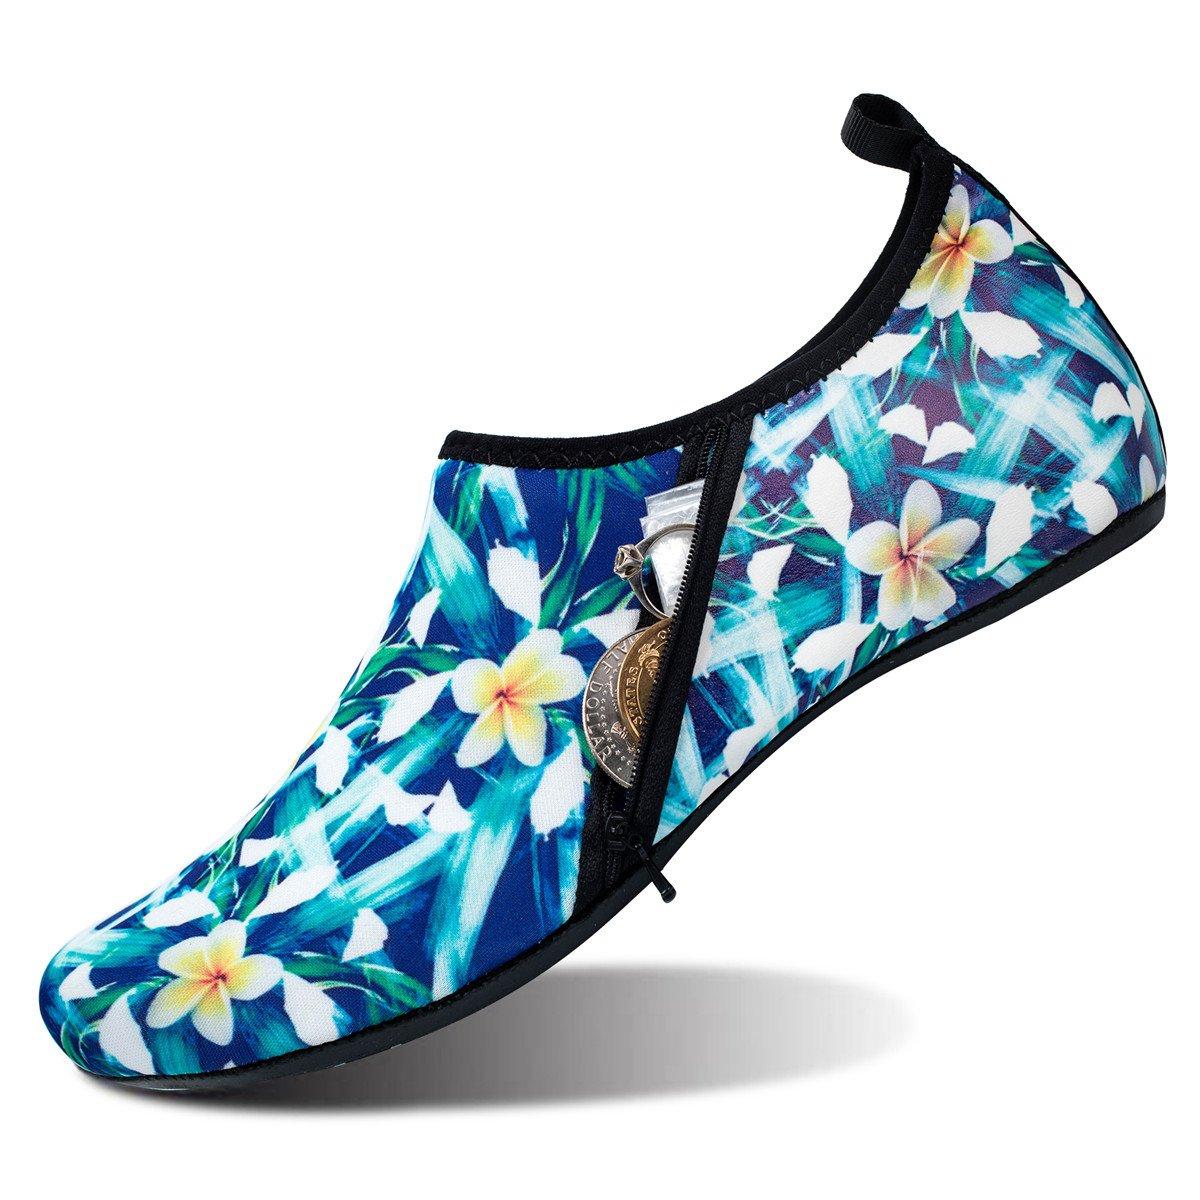 28f9e5449b1d JIASUQI Womens and Mens Summer Outdoor Water Shoes Aqua Socks for Beach Swim  Surf Yoga Exercise